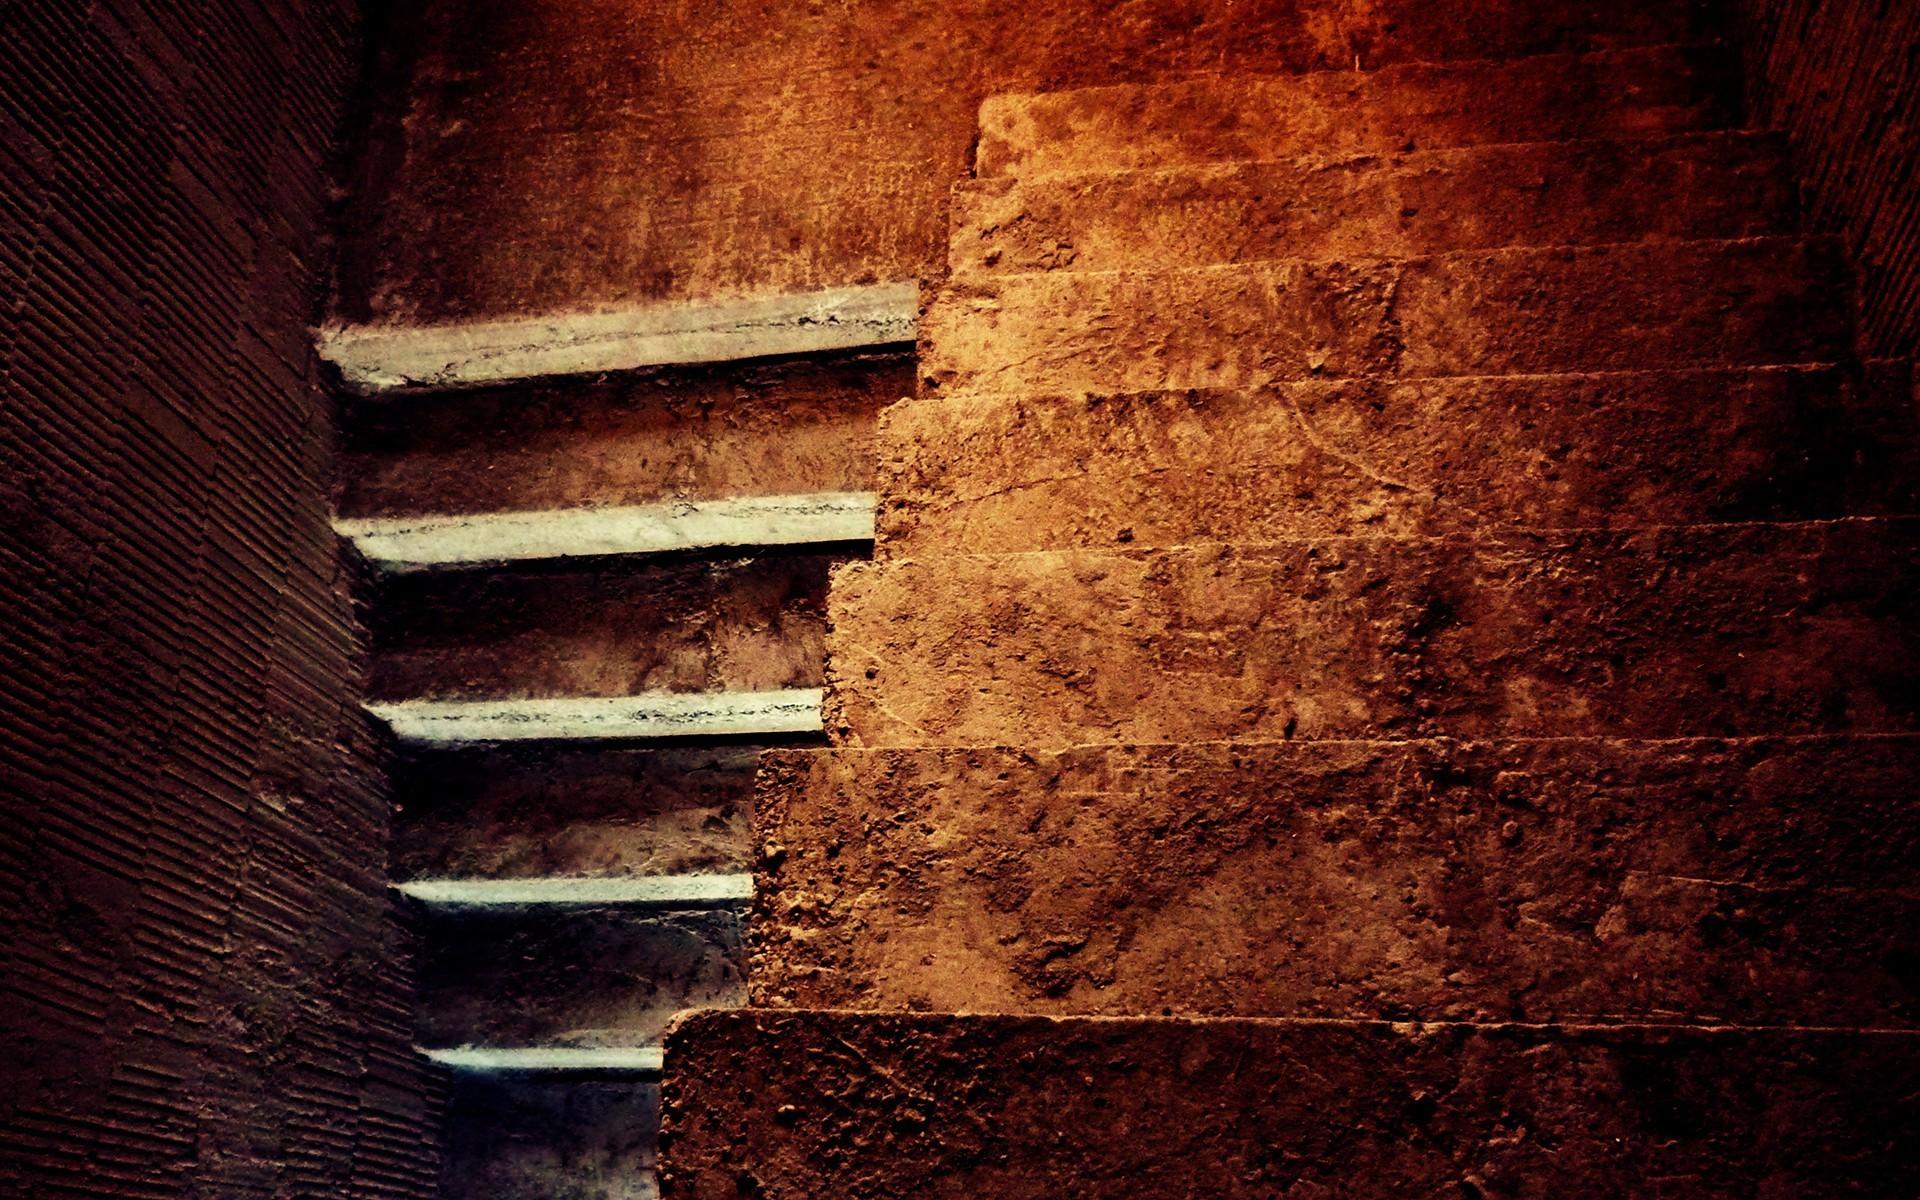 Black Ops Wallpaper Hd 13 Wonderful Hd Stairs Wallpapers Hdwallsource Com